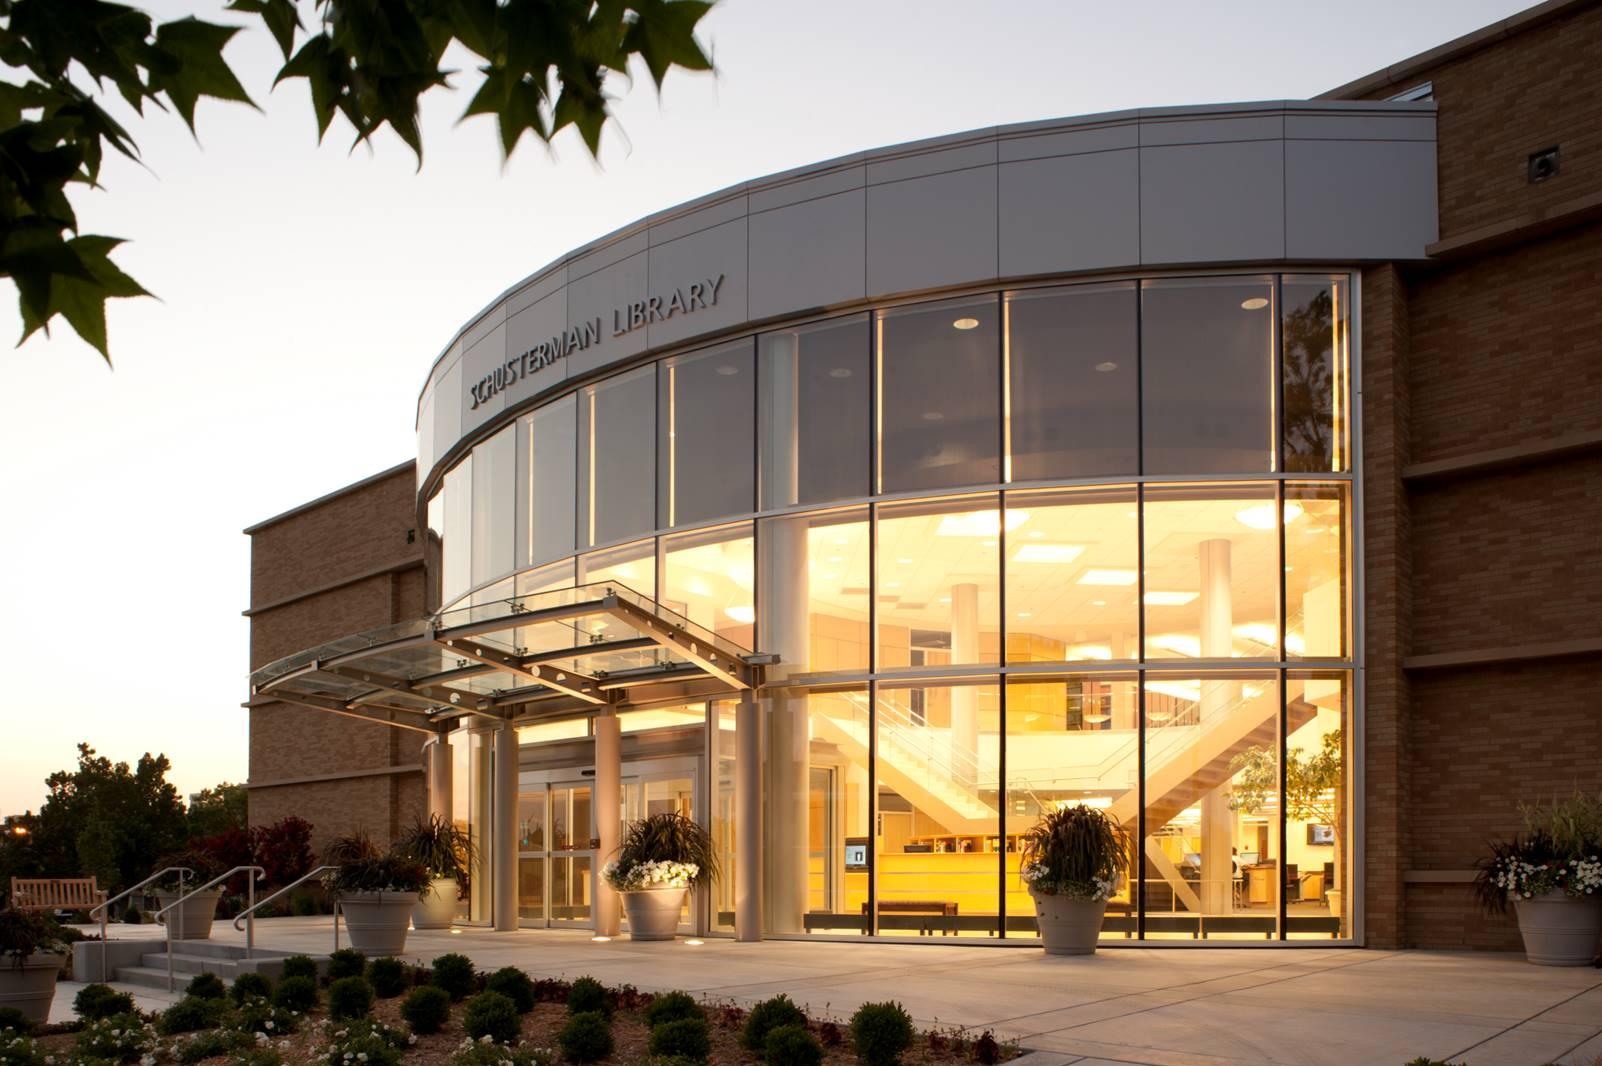 Schusterman Library, OU Tulsa campus